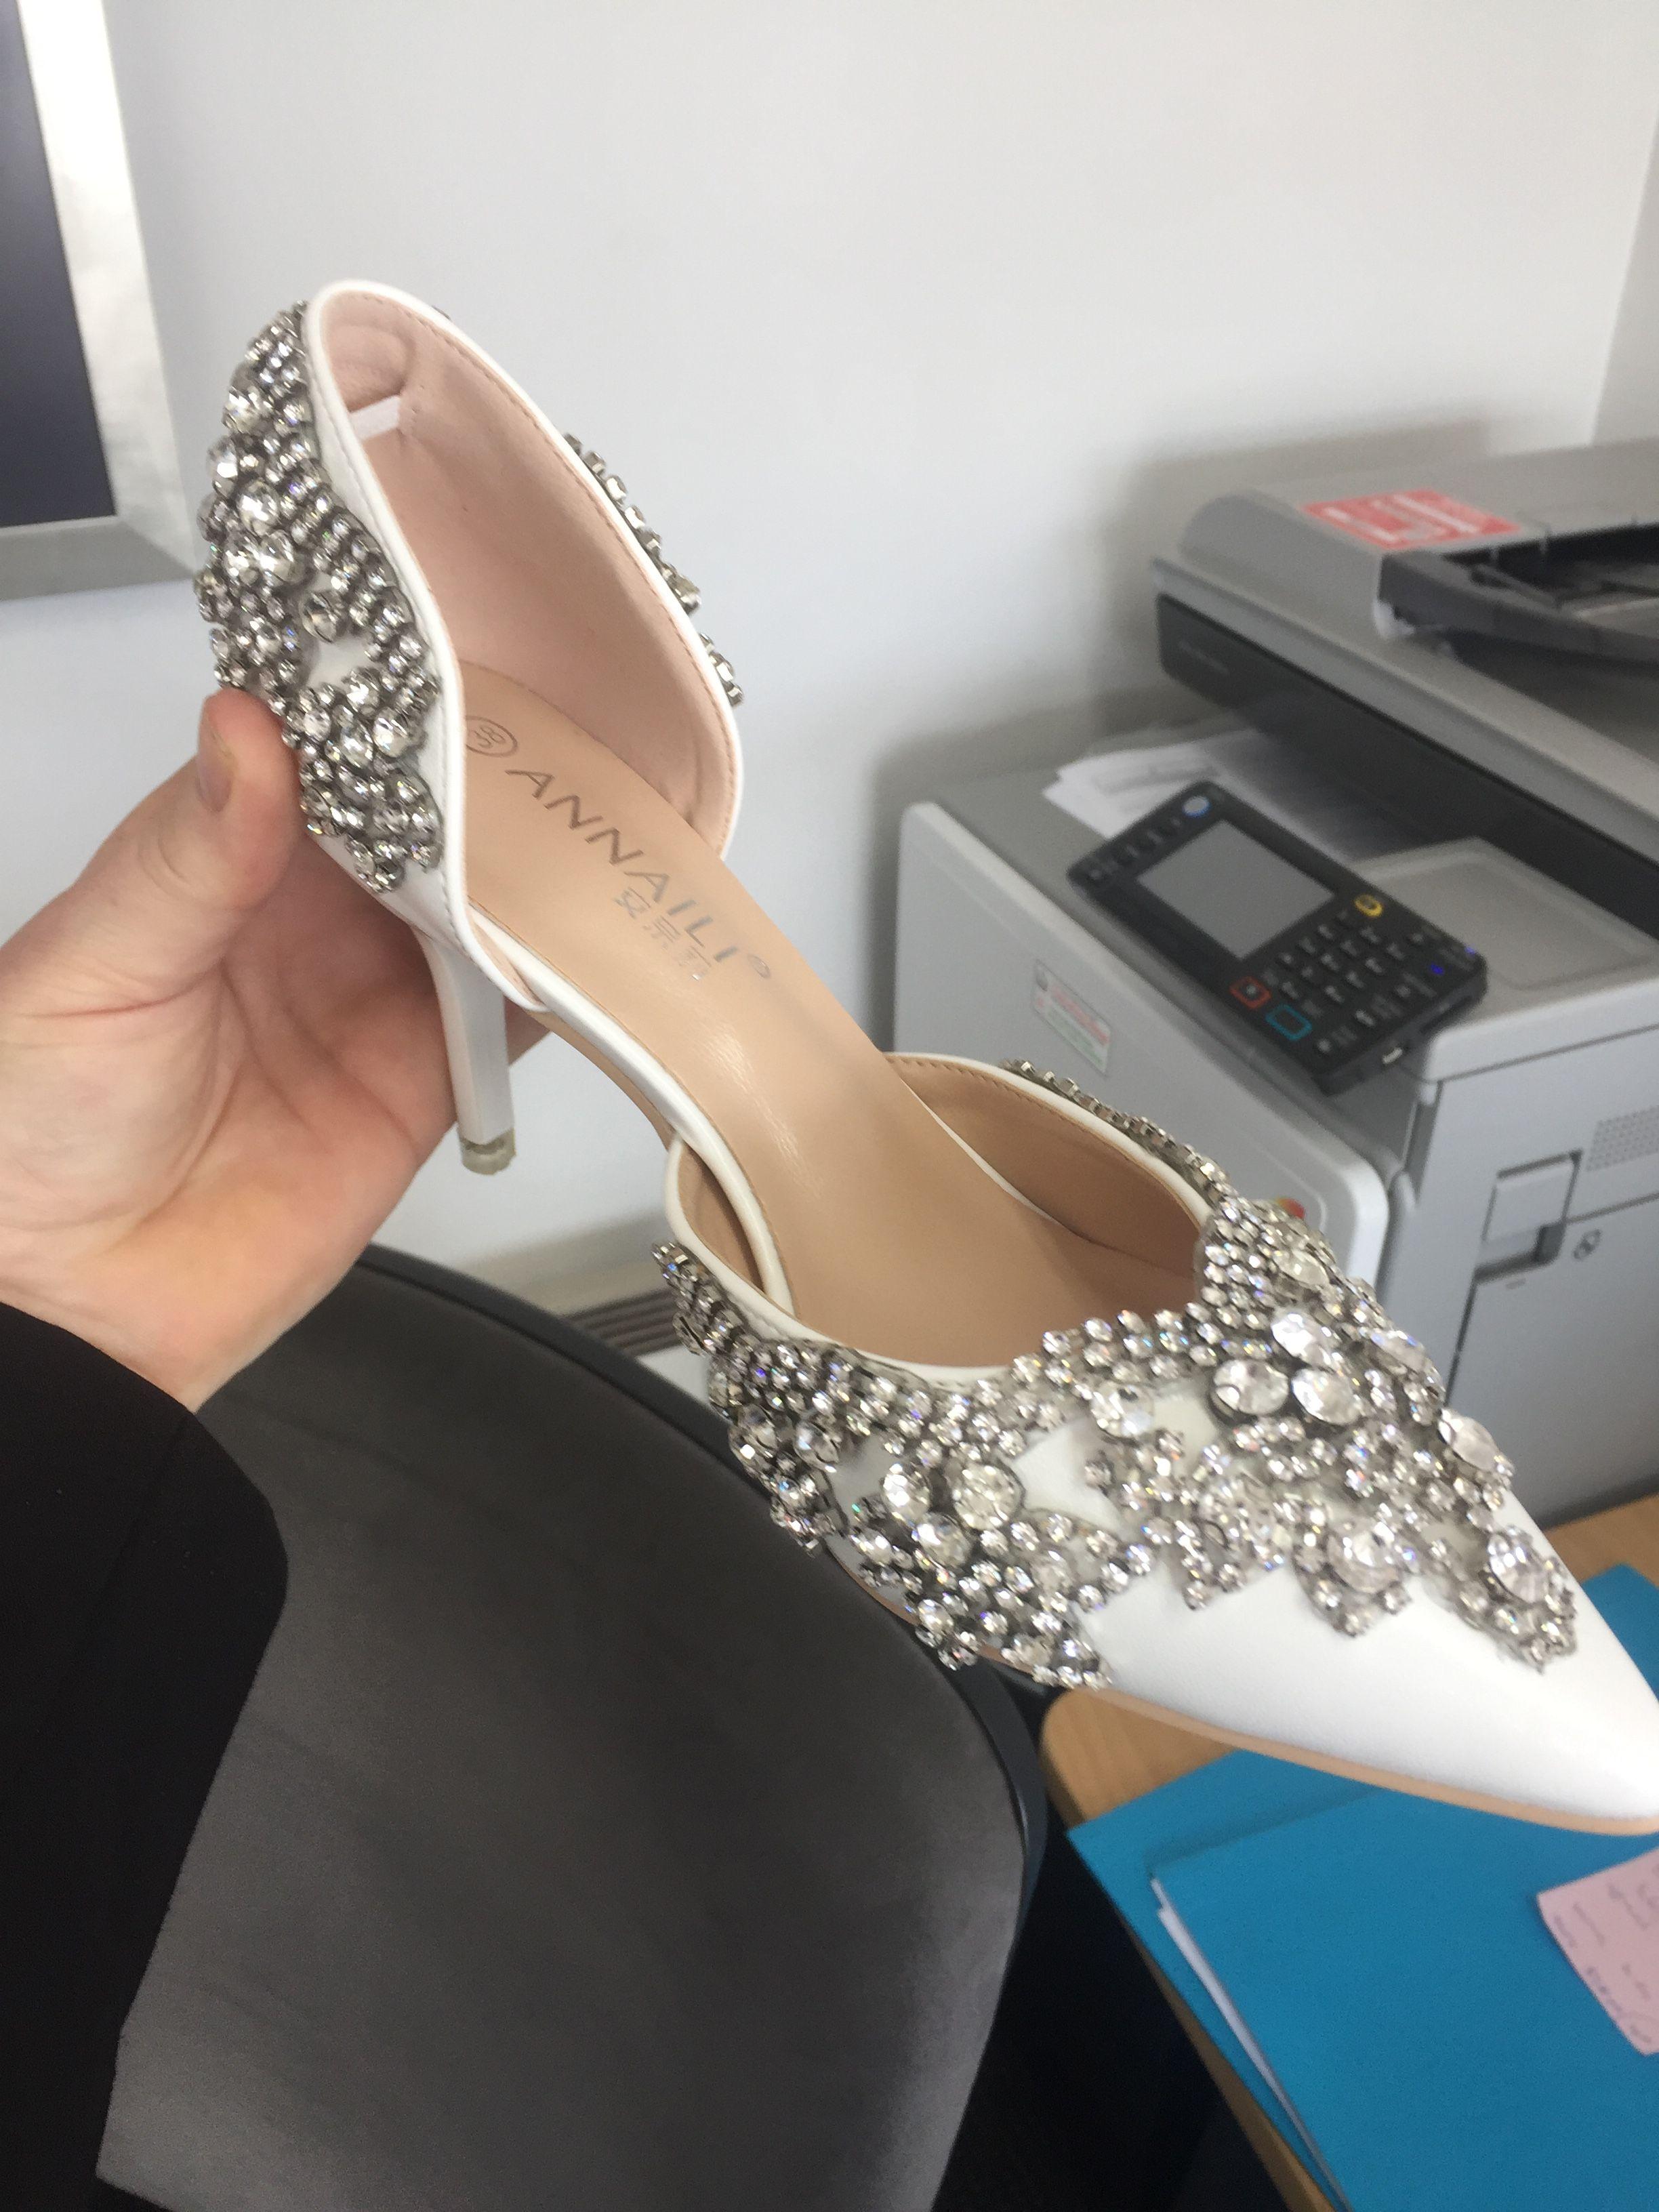 5598ad0893 Women's Closed Toe Pumps Sandals Stiletto Heel Leatherette Rhinestone  Wedding Shoes